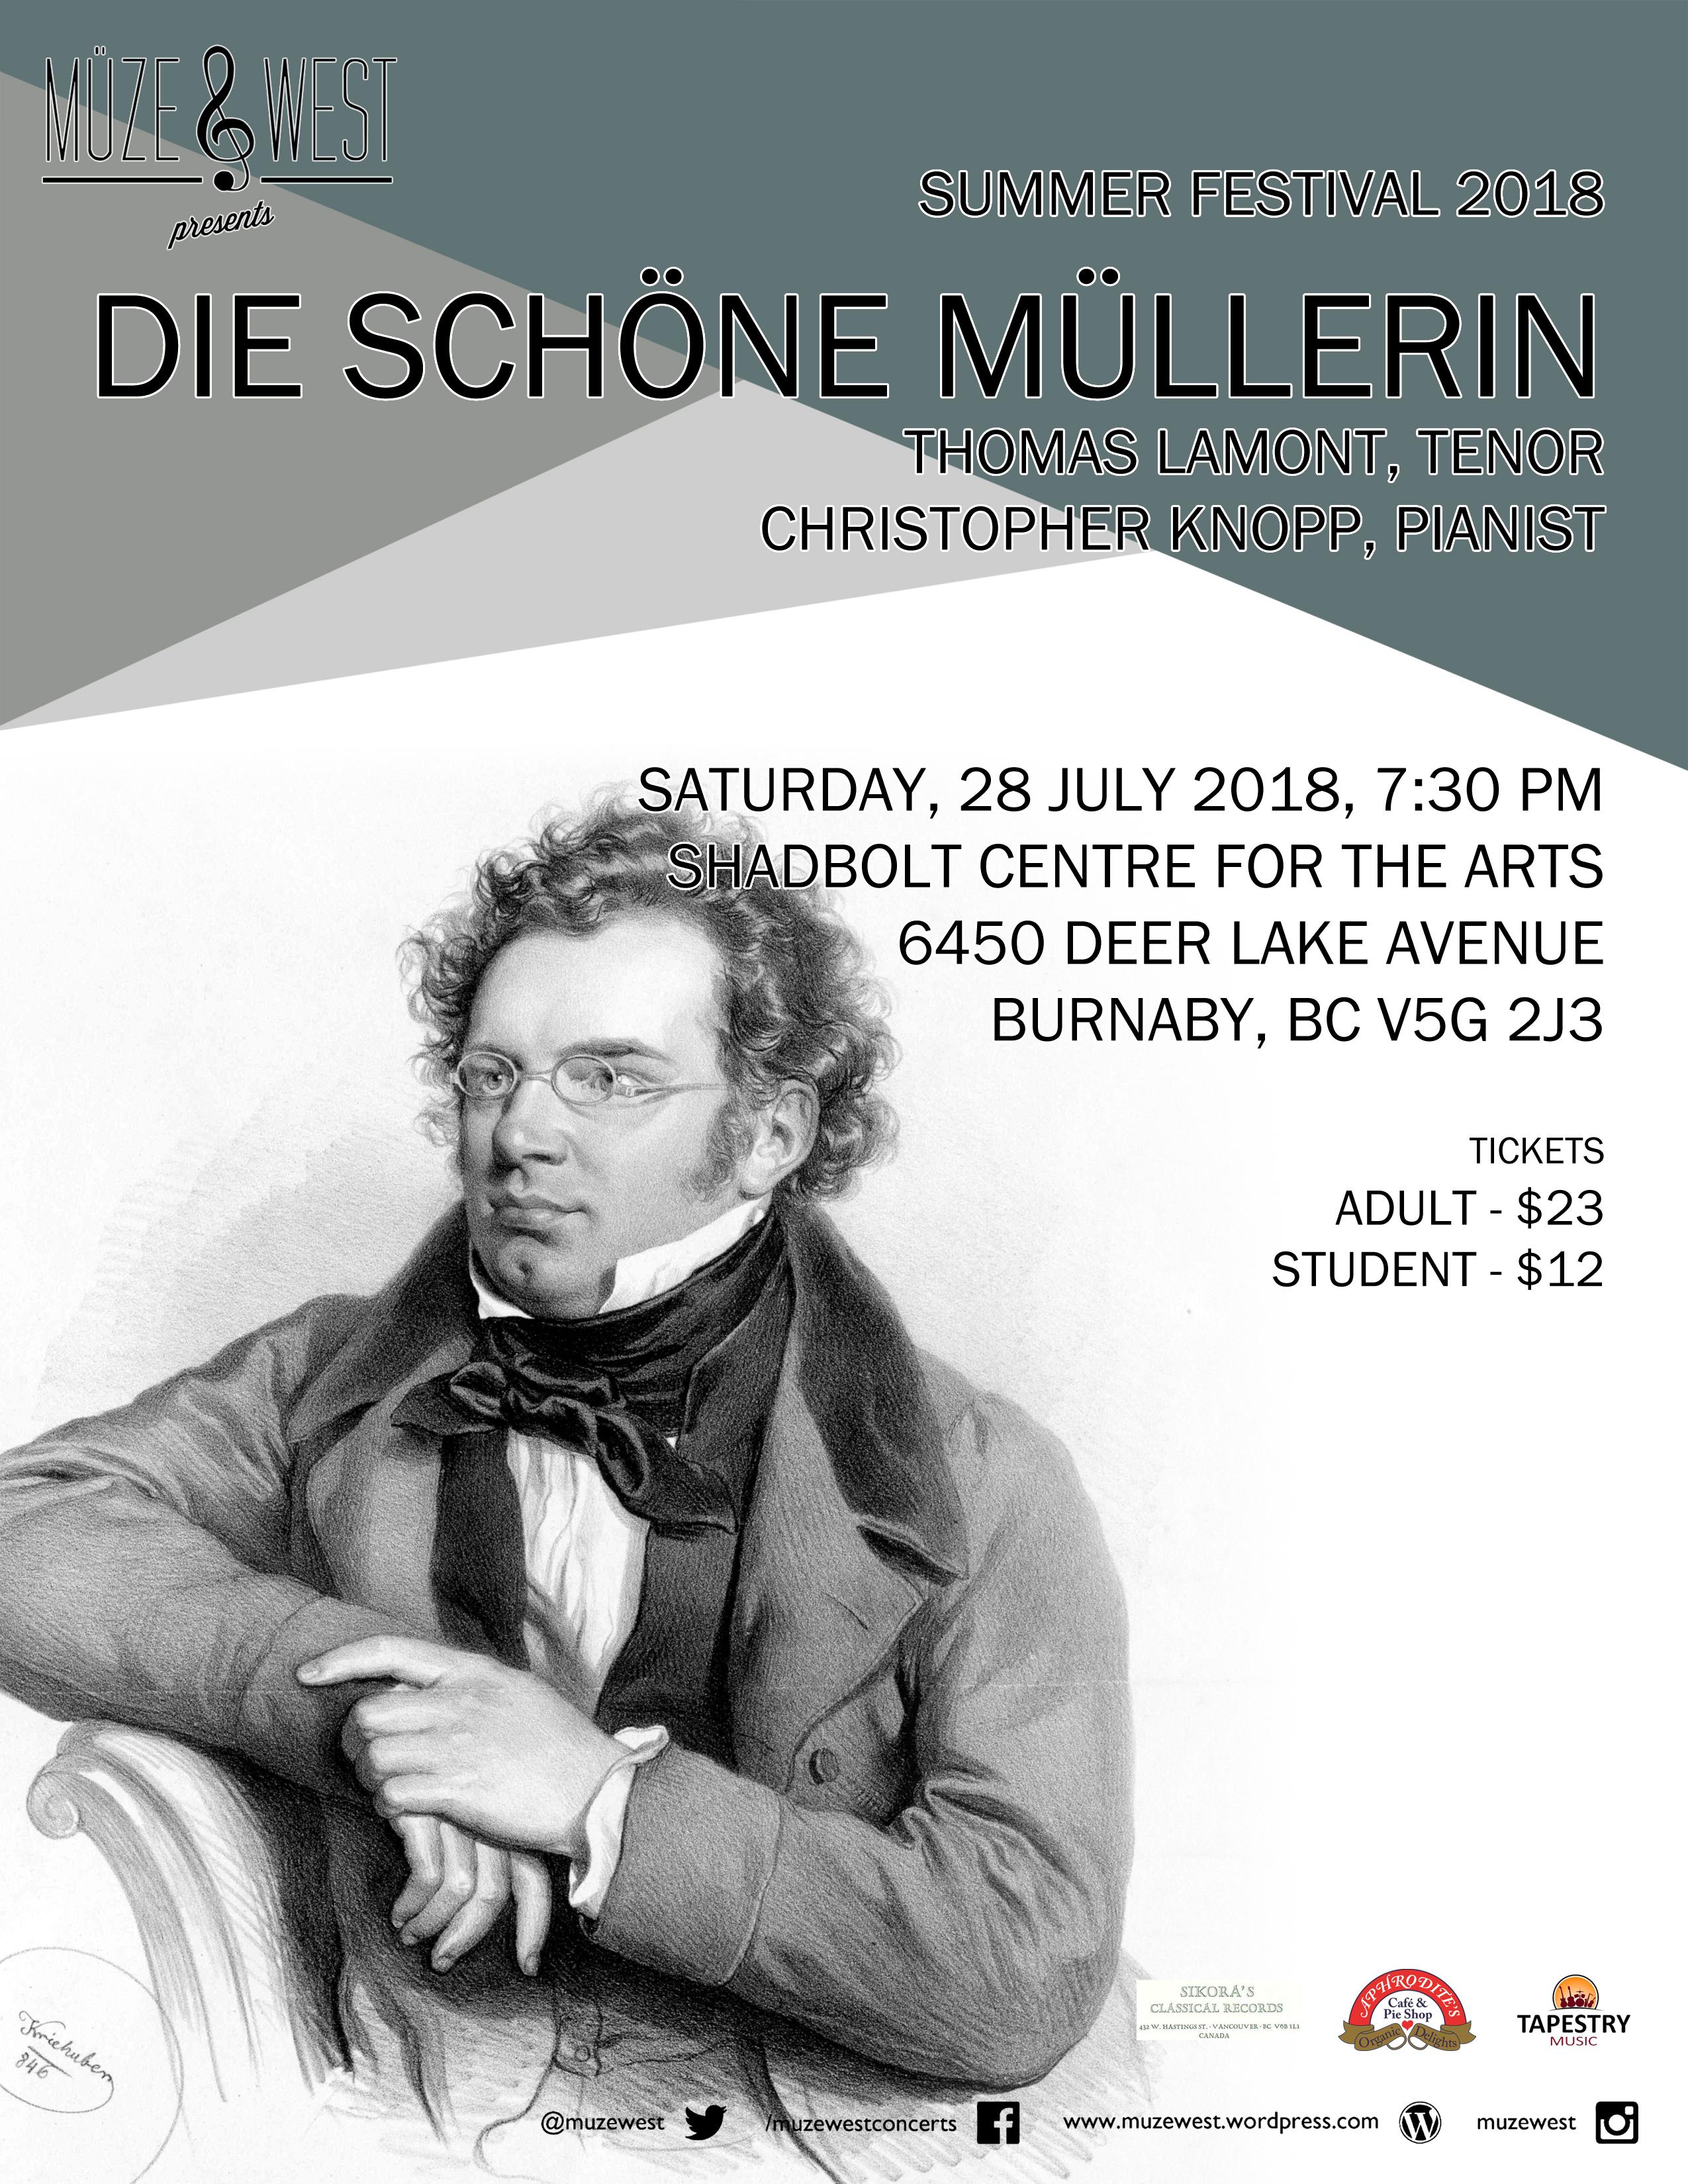 Sat. July 28 – 7:30 PM, Die Schöne Müllerin – Shadbolt Centre for the Performing Arts